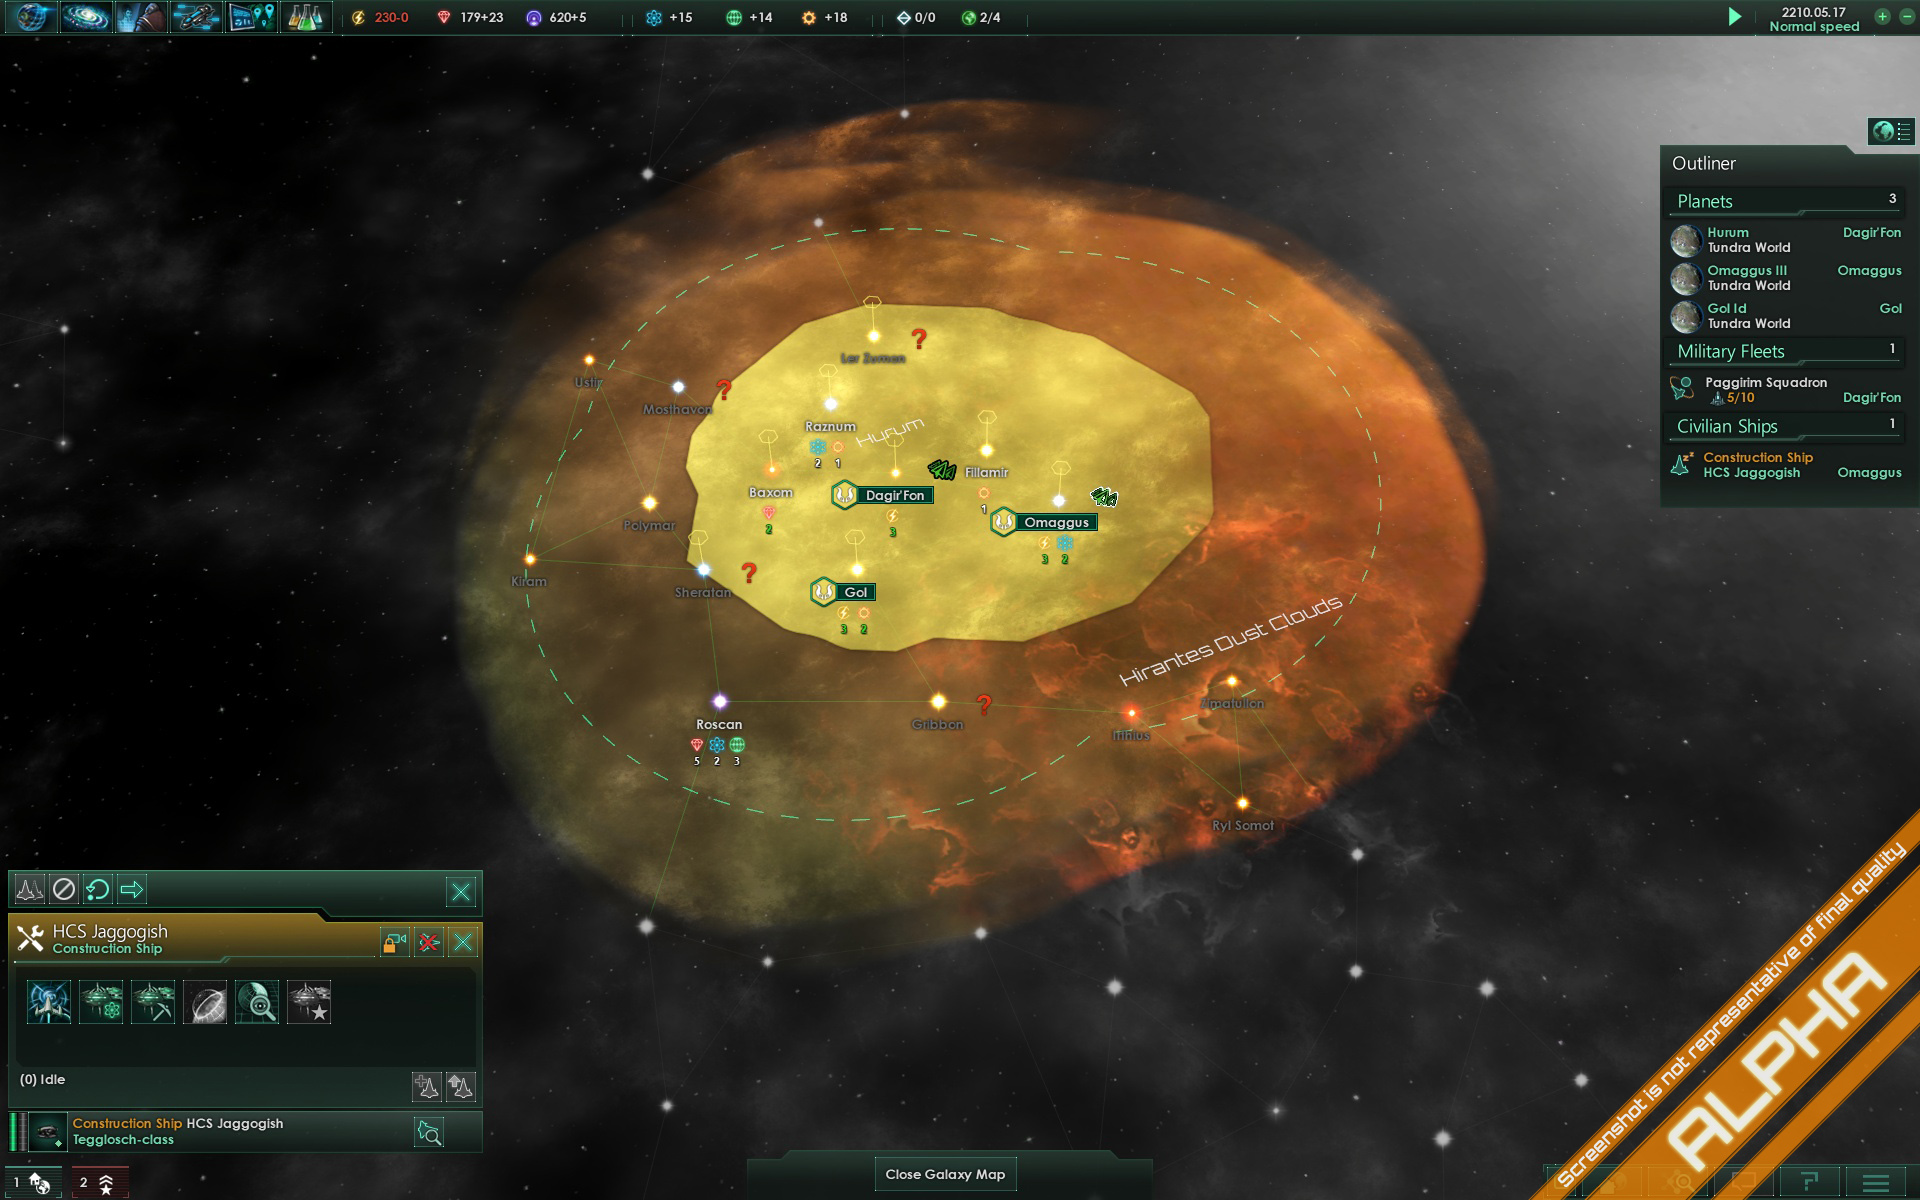 stellaris_dev_diary_09_03_20151116_galaxy_view.jpg